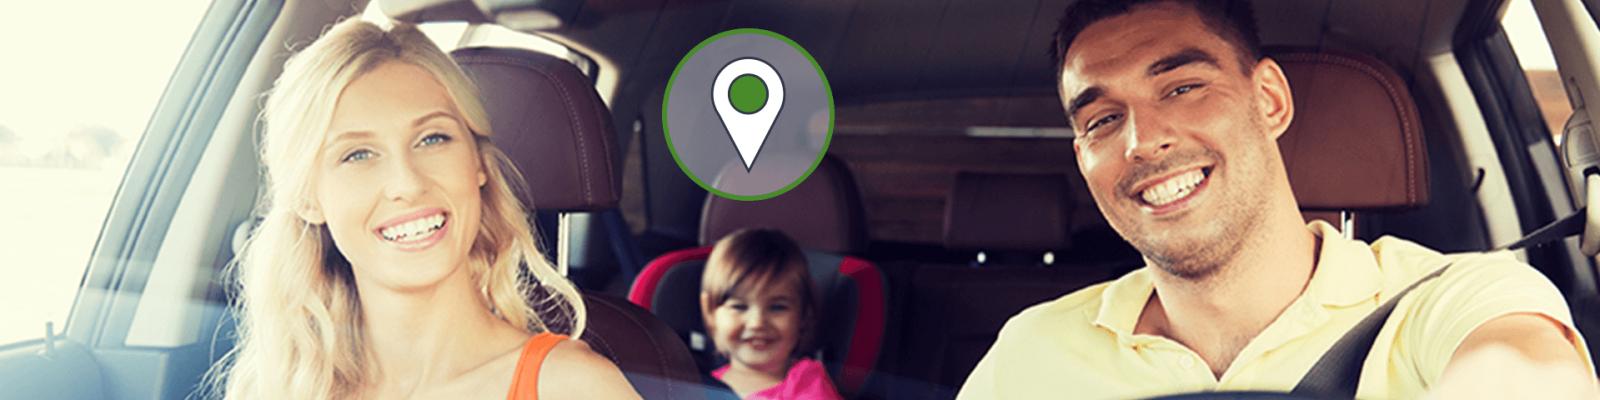 Elo GPS - Profit Center for Dealers - CDS